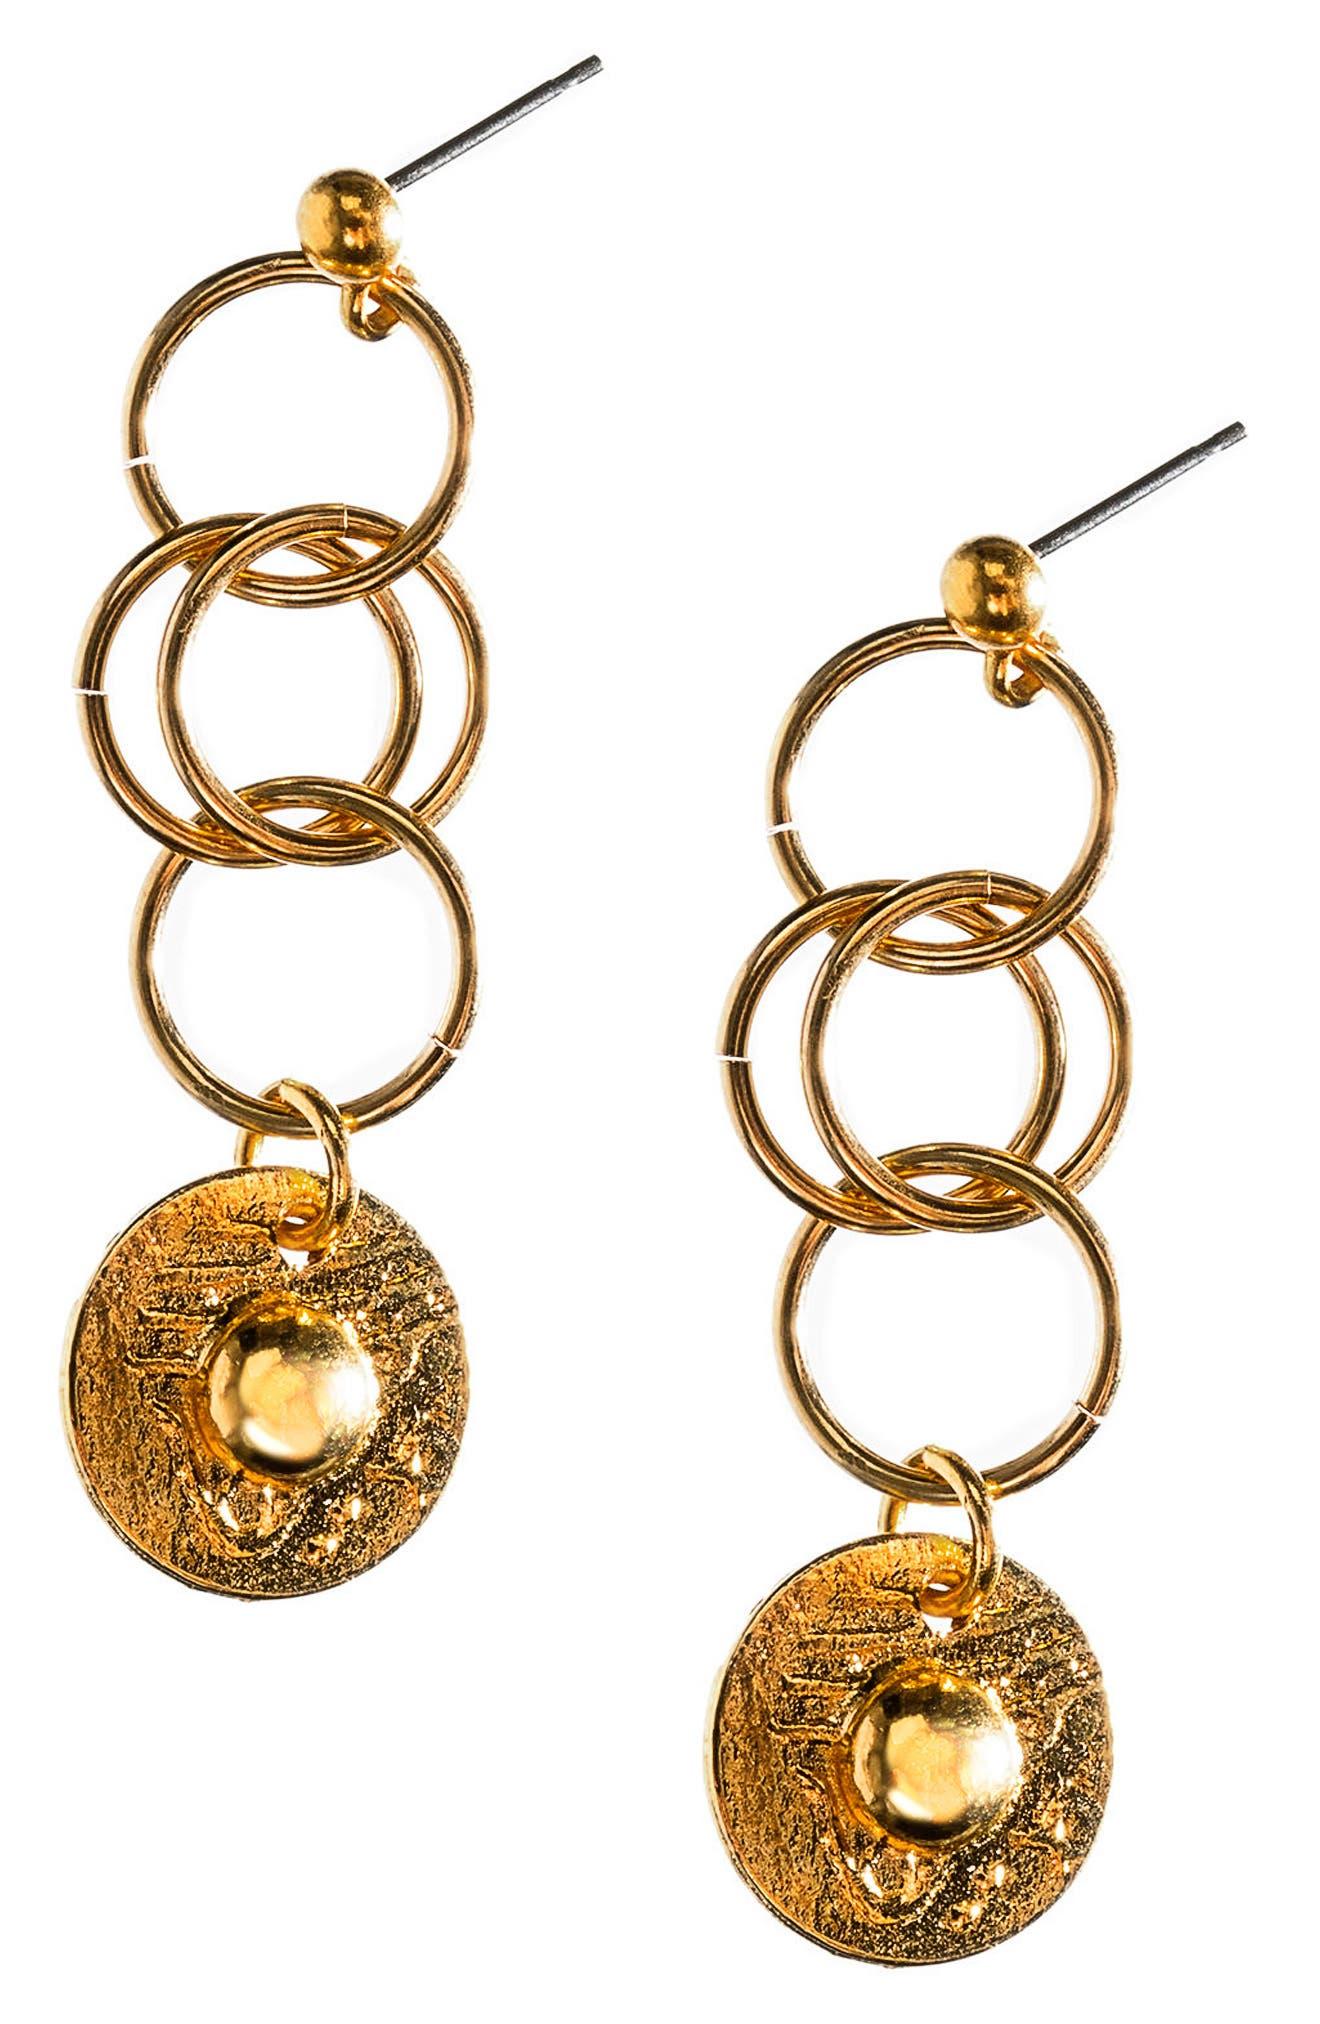 Main Image - MHART Tri Hoop Coin Earrings